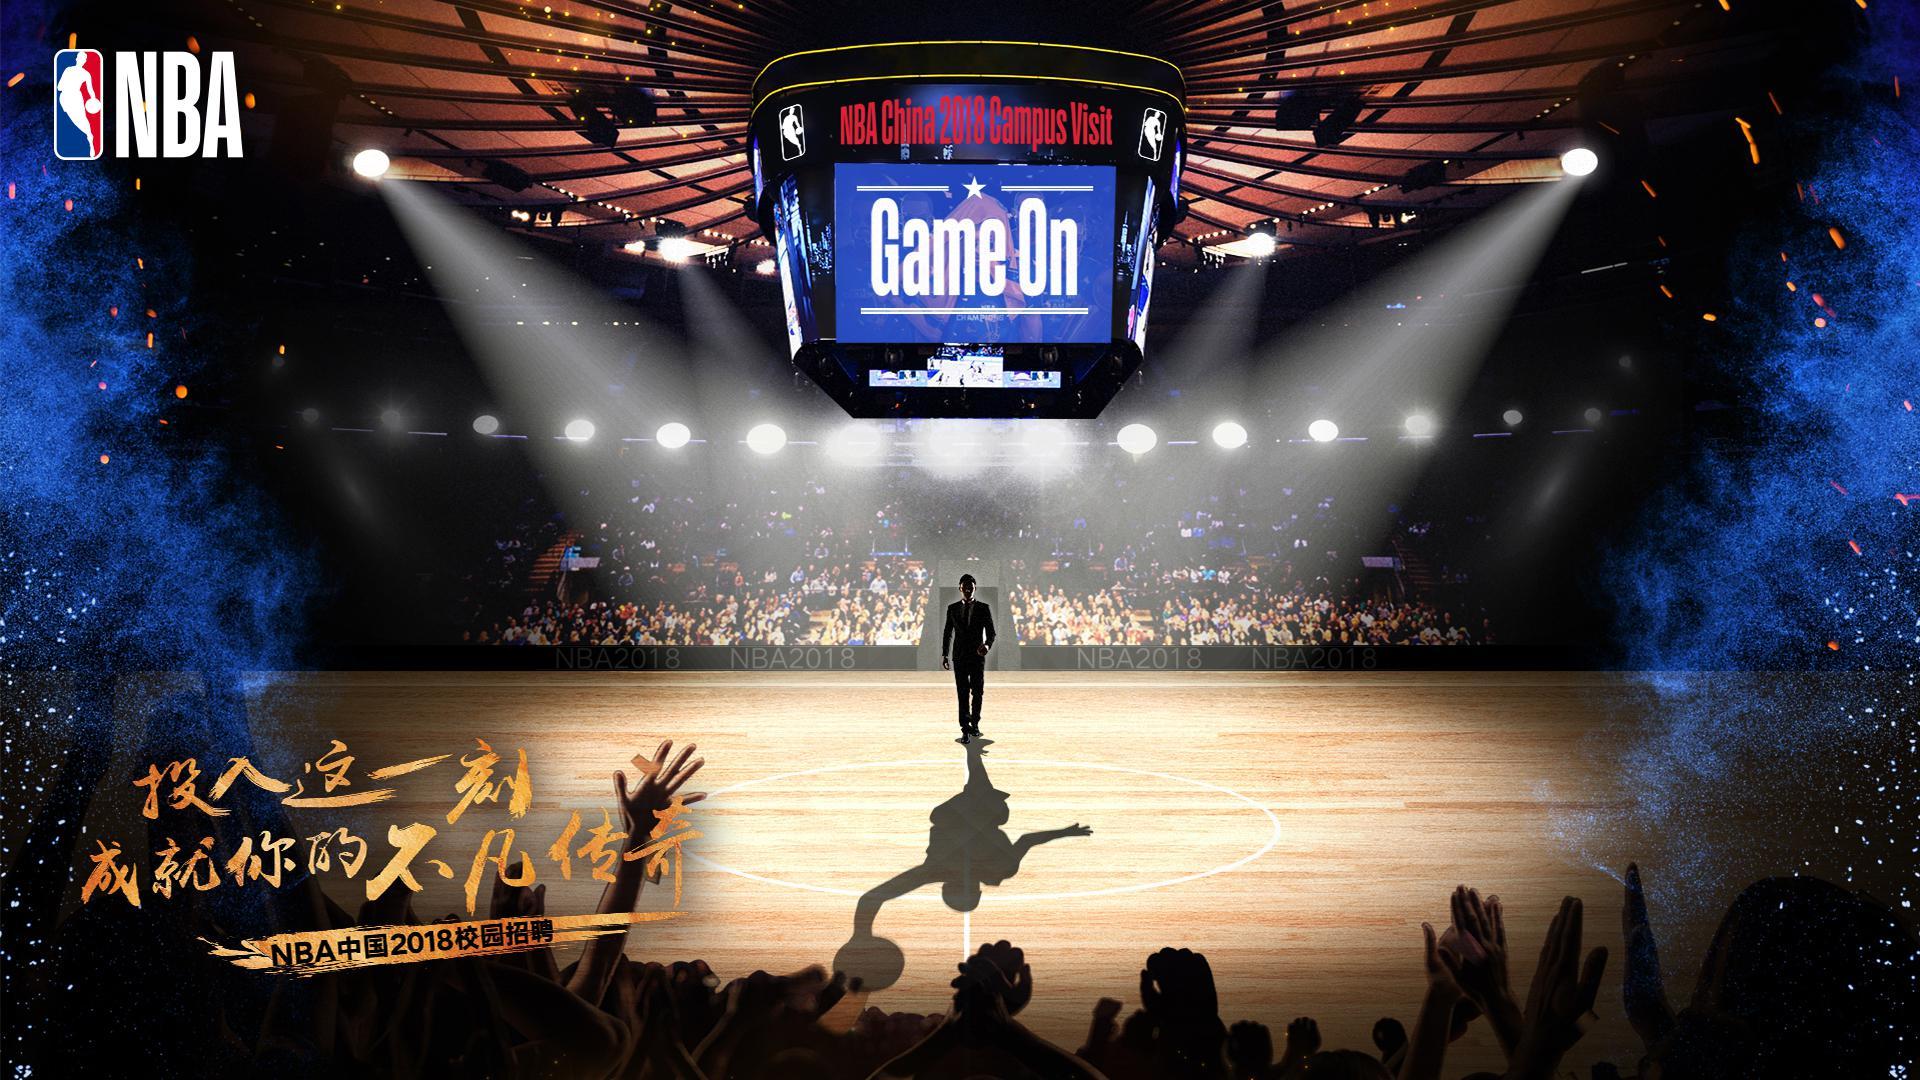 NBA中国2018校园招聘上海博览会